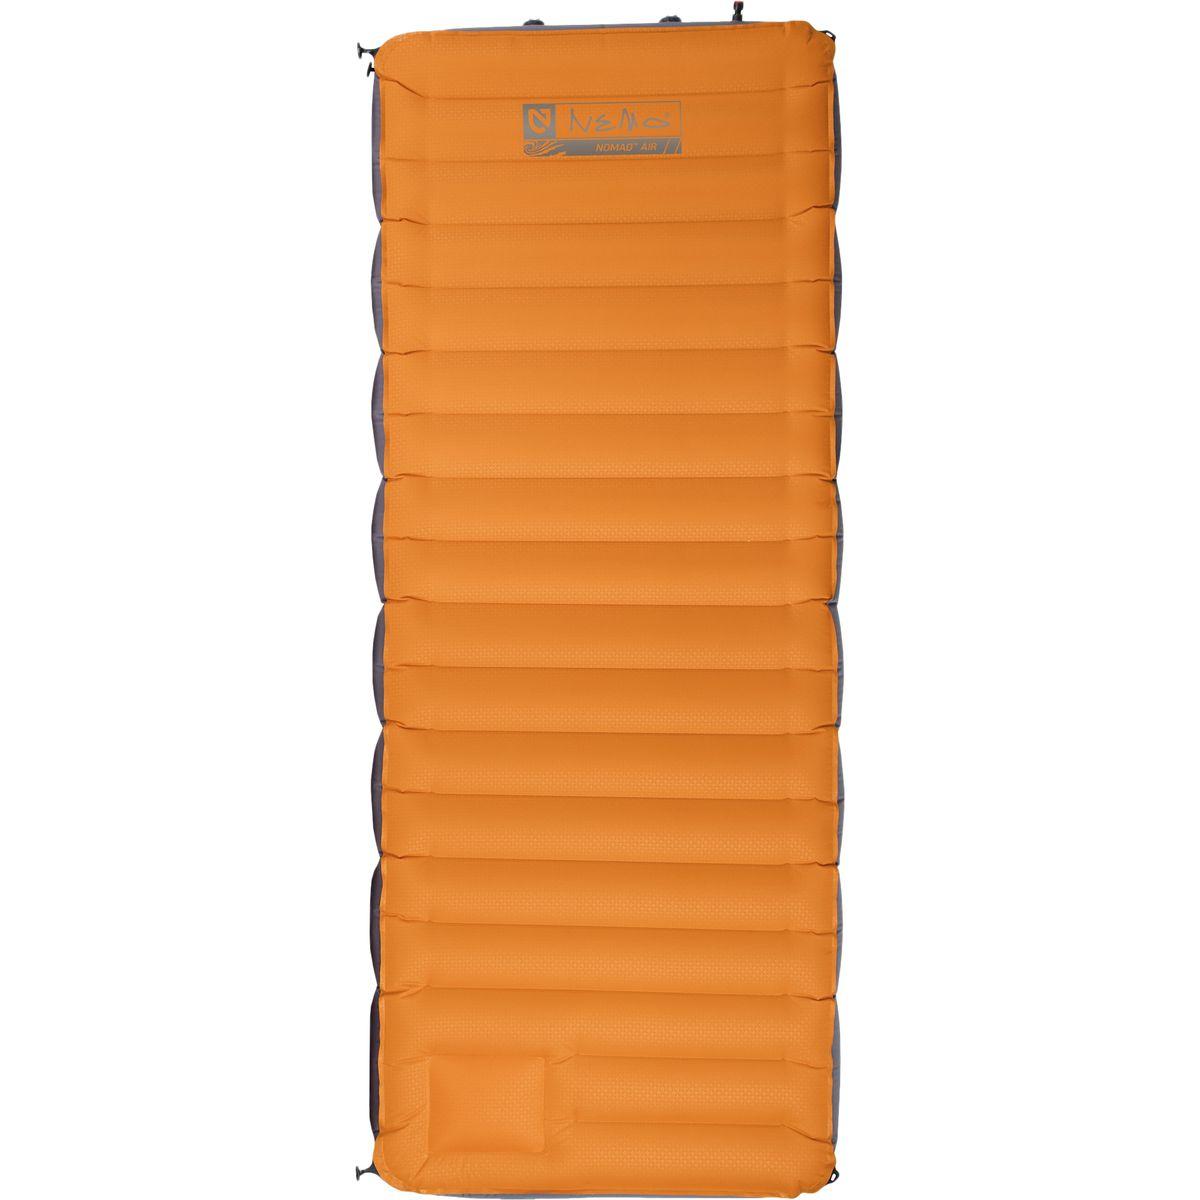 NEMO Nomad Insulated